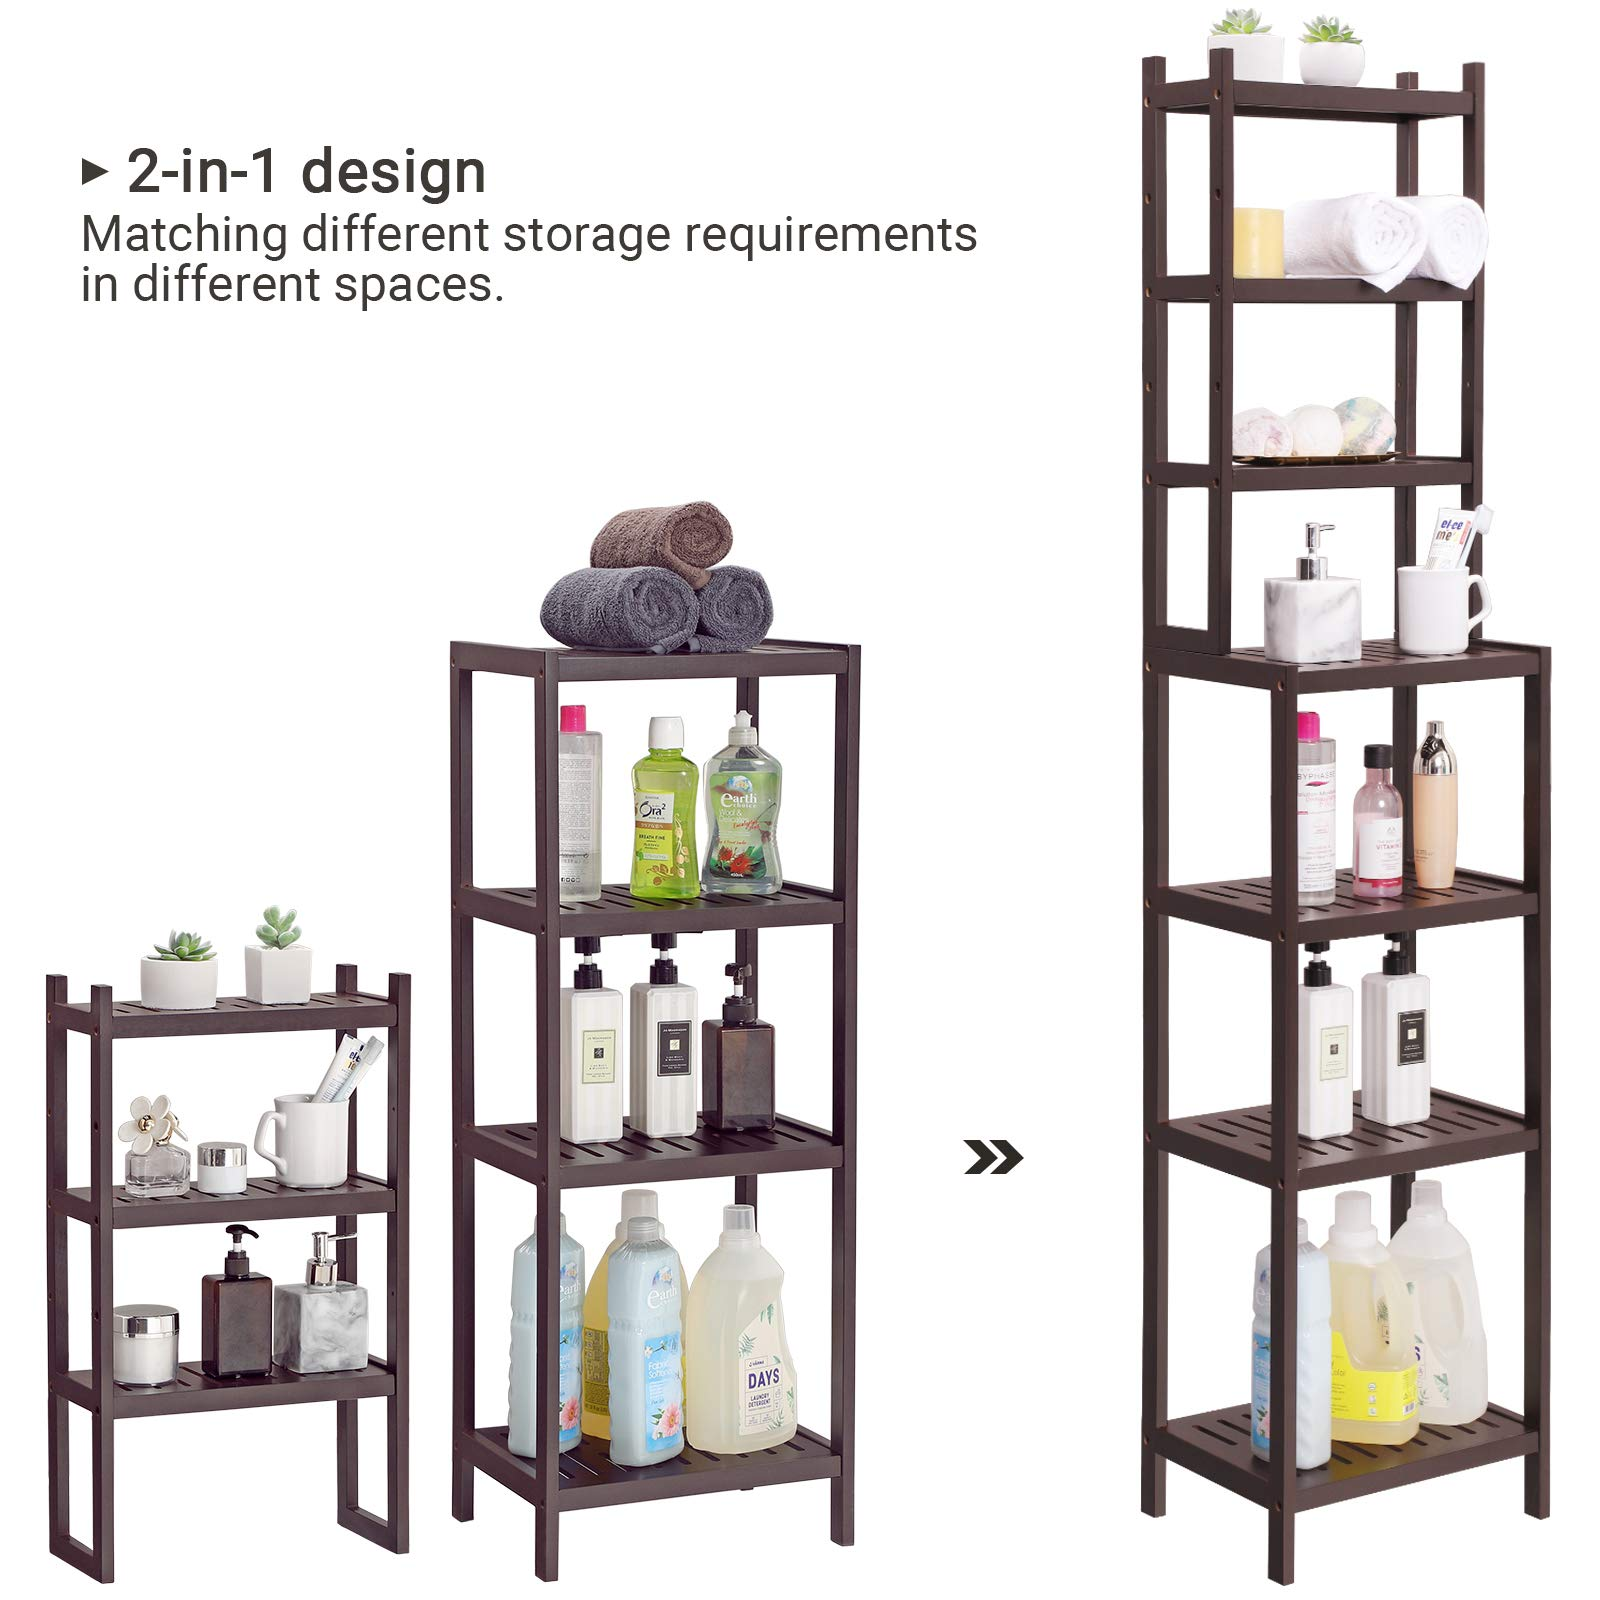 SONGMICS 7-Tier Bamboo Bathroom Shelf, 2-in-1 Design Adjustable Storage Rack, Free Standing Multifunctional Organizer, Shelving Unit for Washroom, Living Room, Kitchen, Brown UBCR01BR by SONGMICS (Image #2)